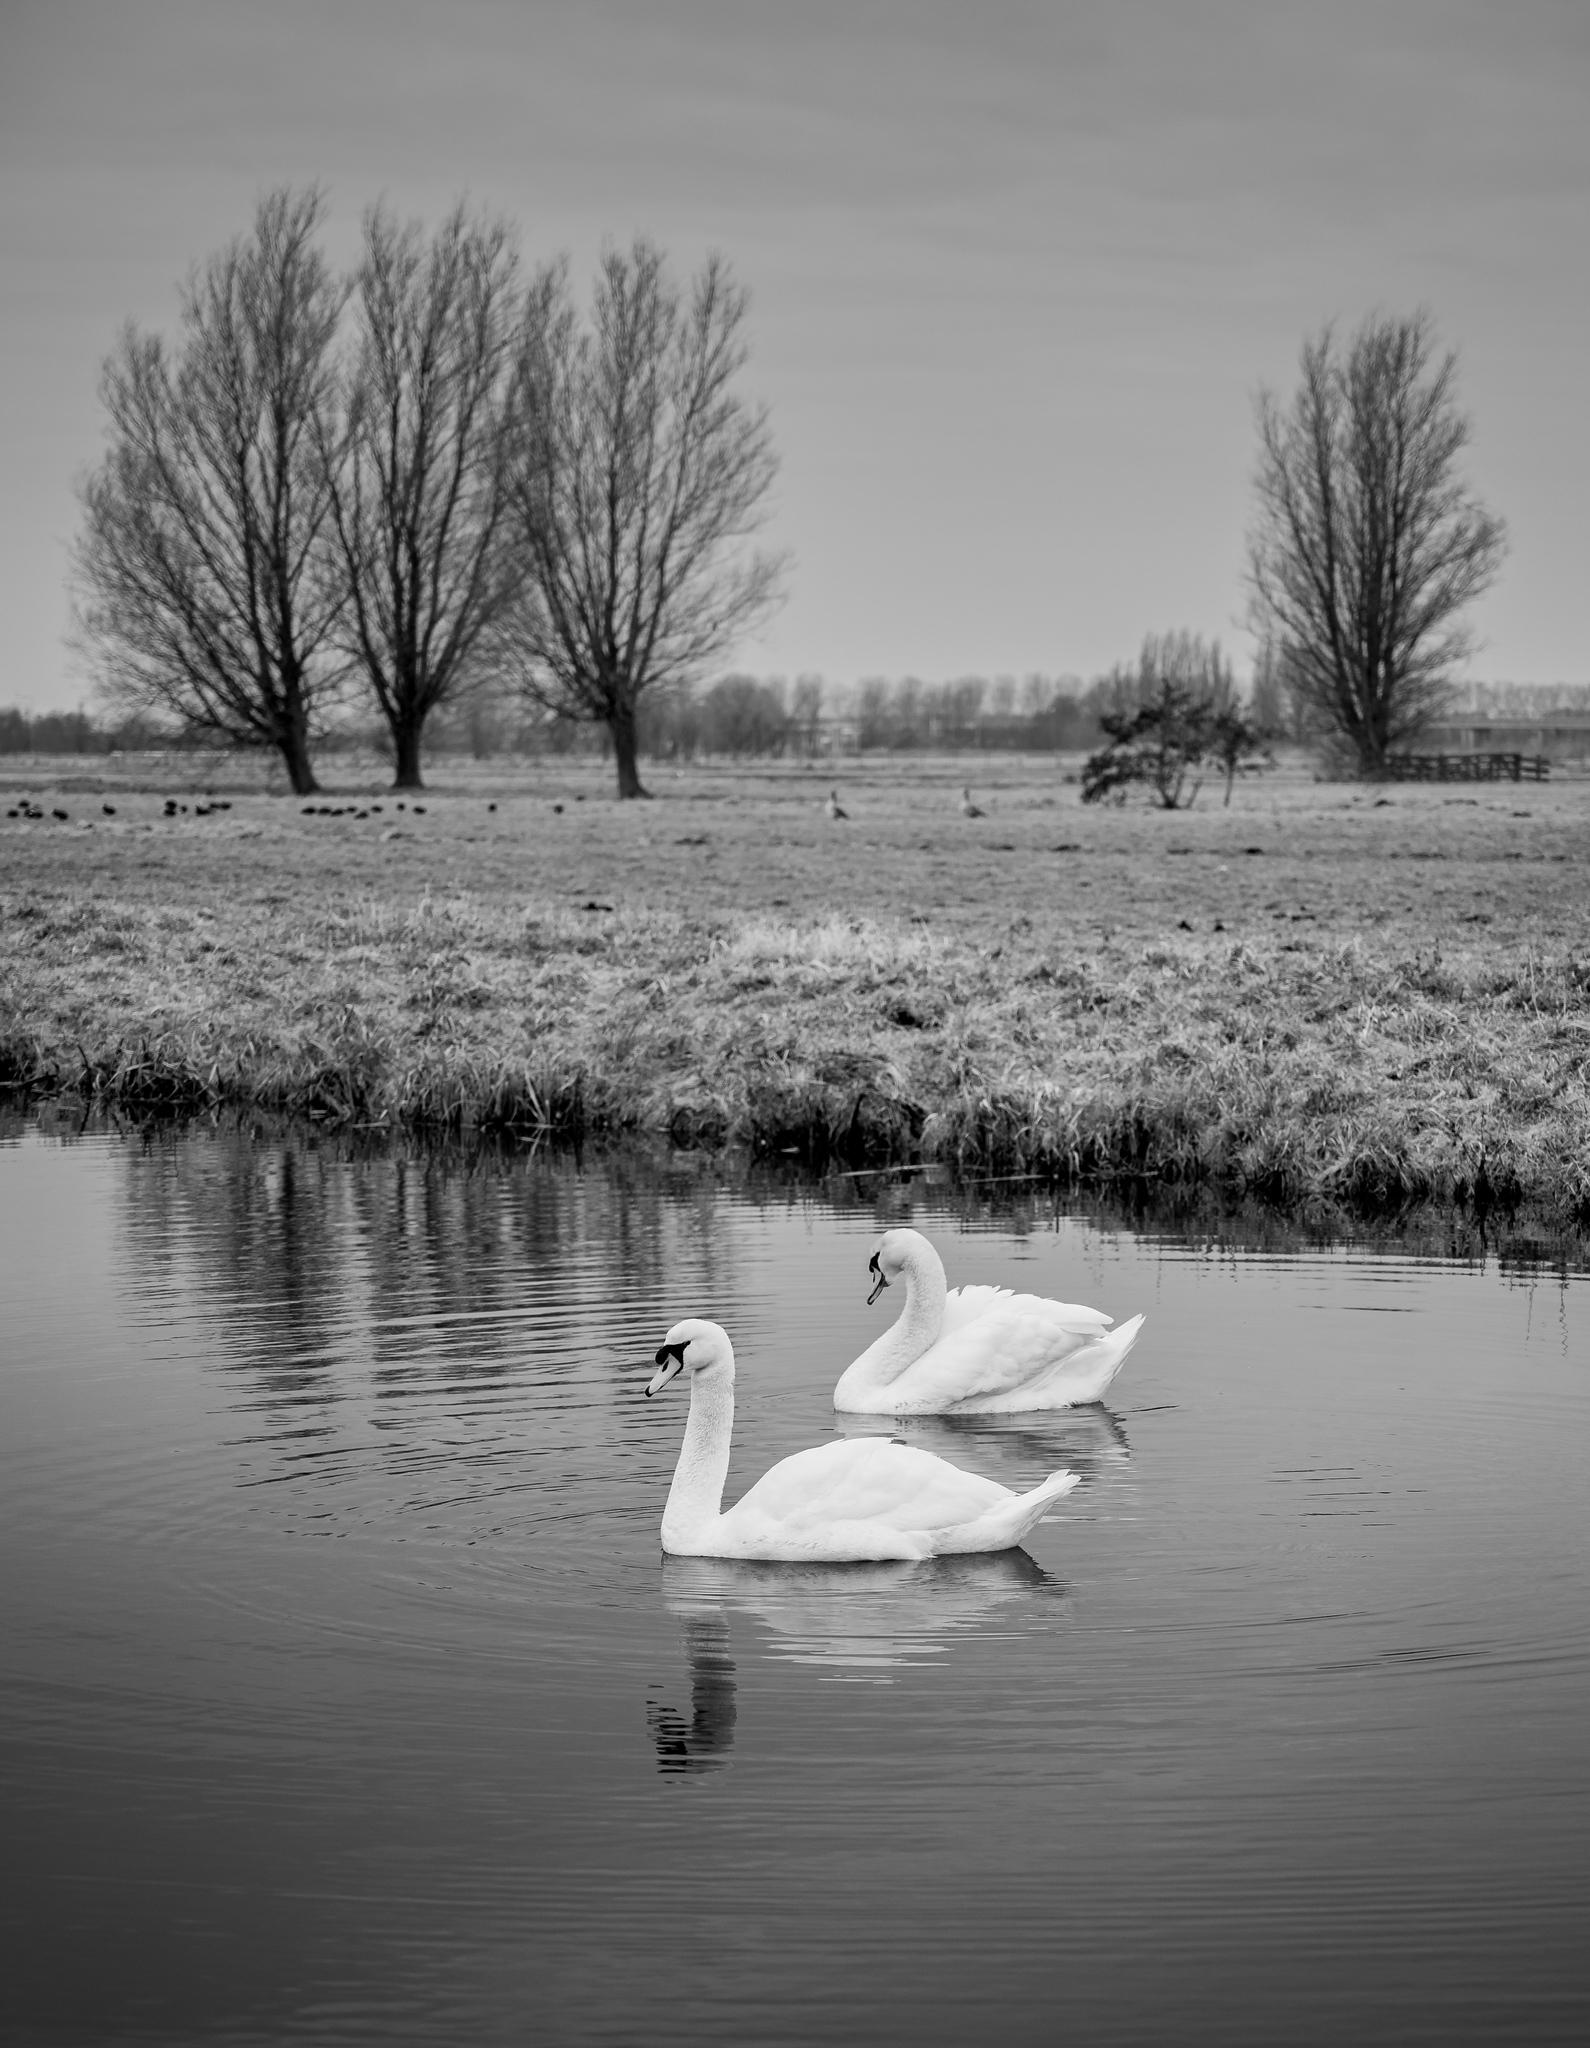 Photo: 2021-01-16-het-weegje-85.jpg